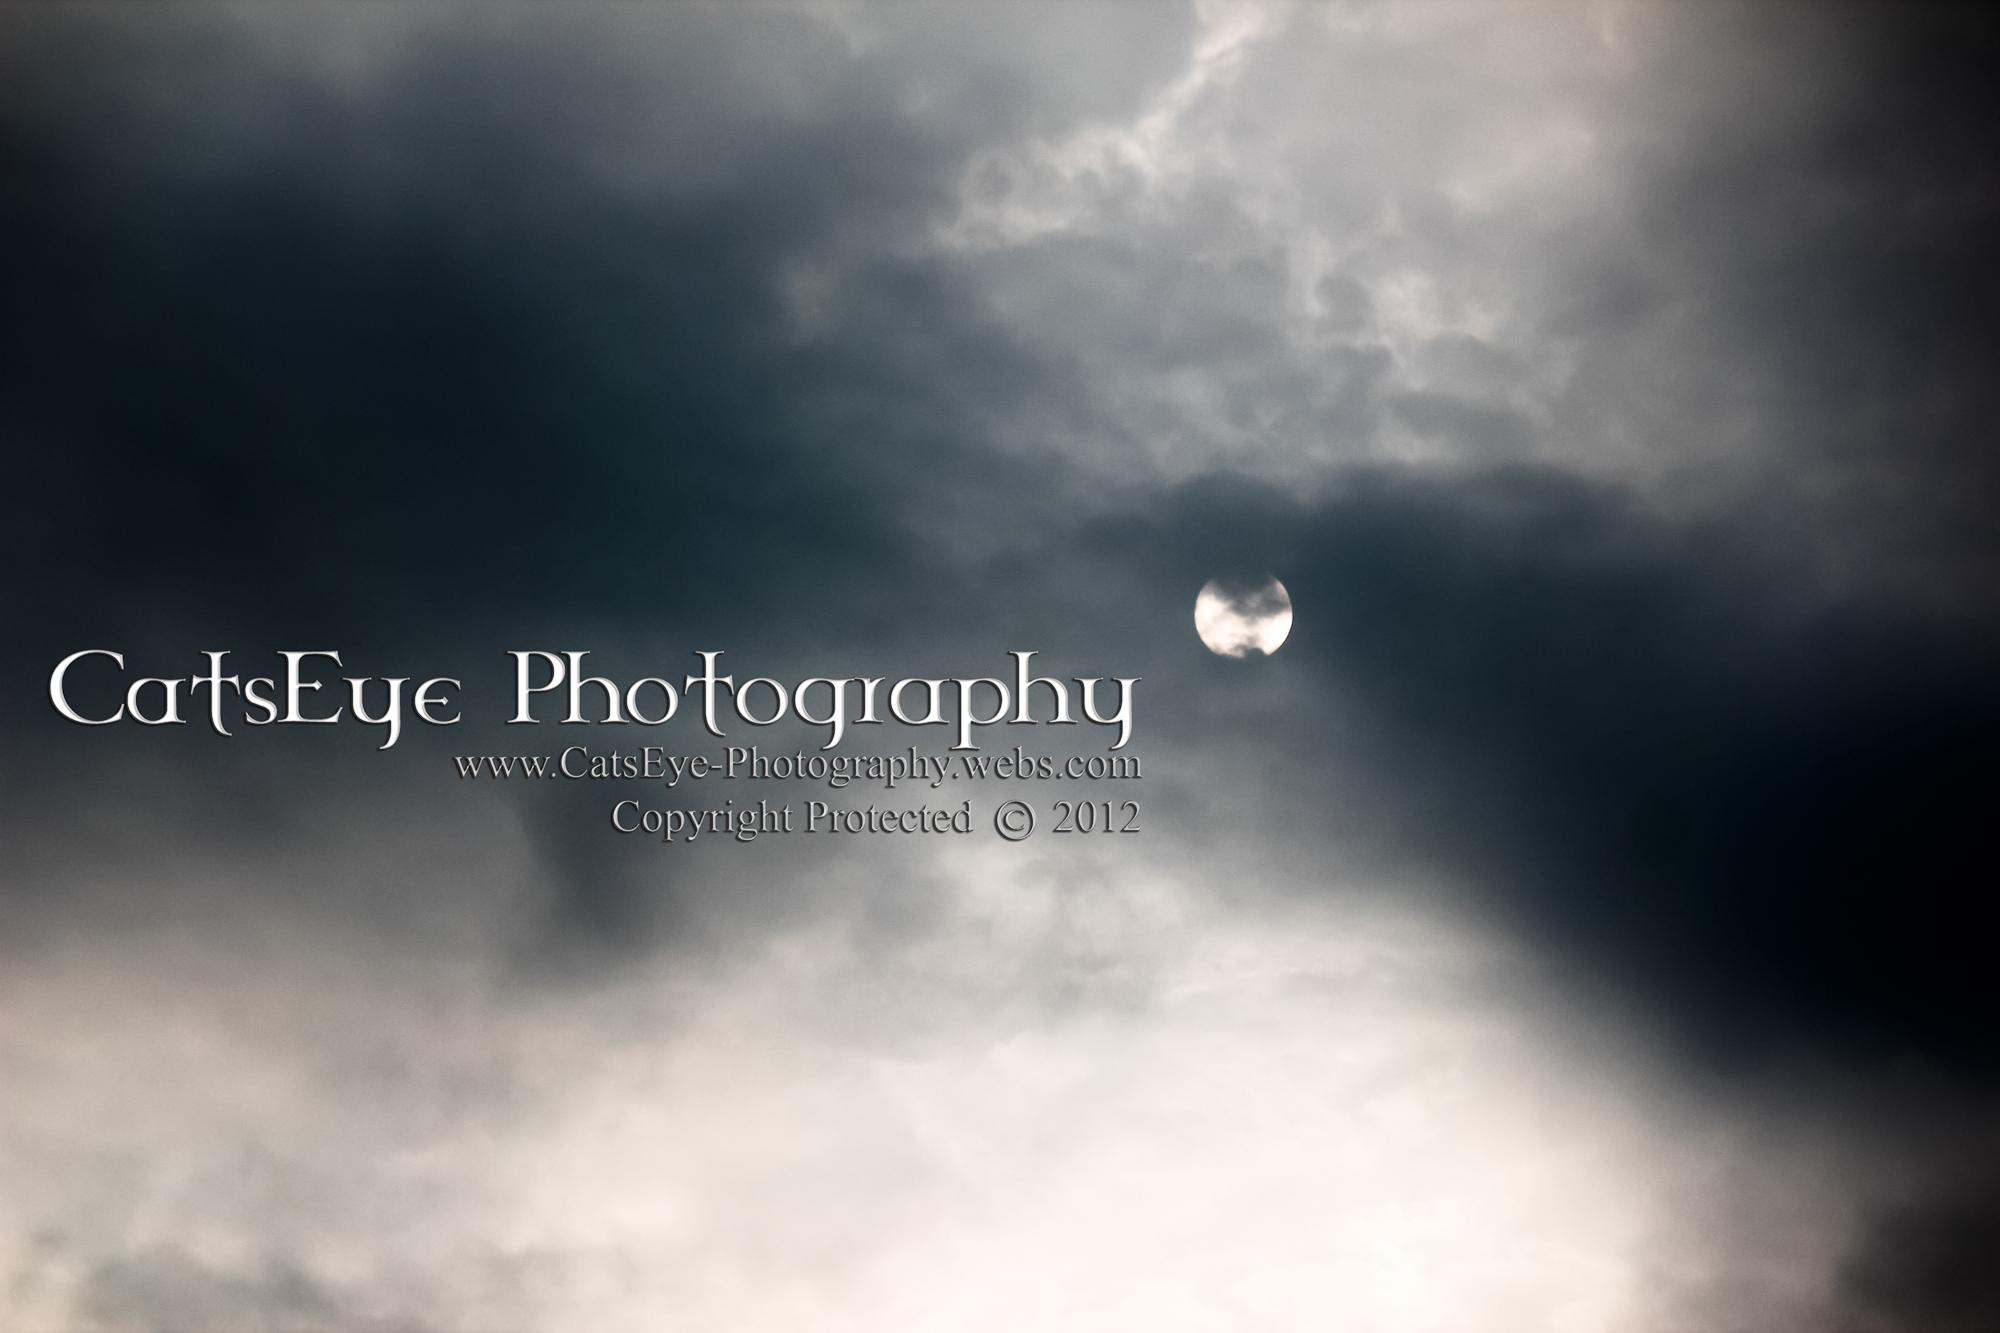 EVOC2012.GVPD.26.jpg